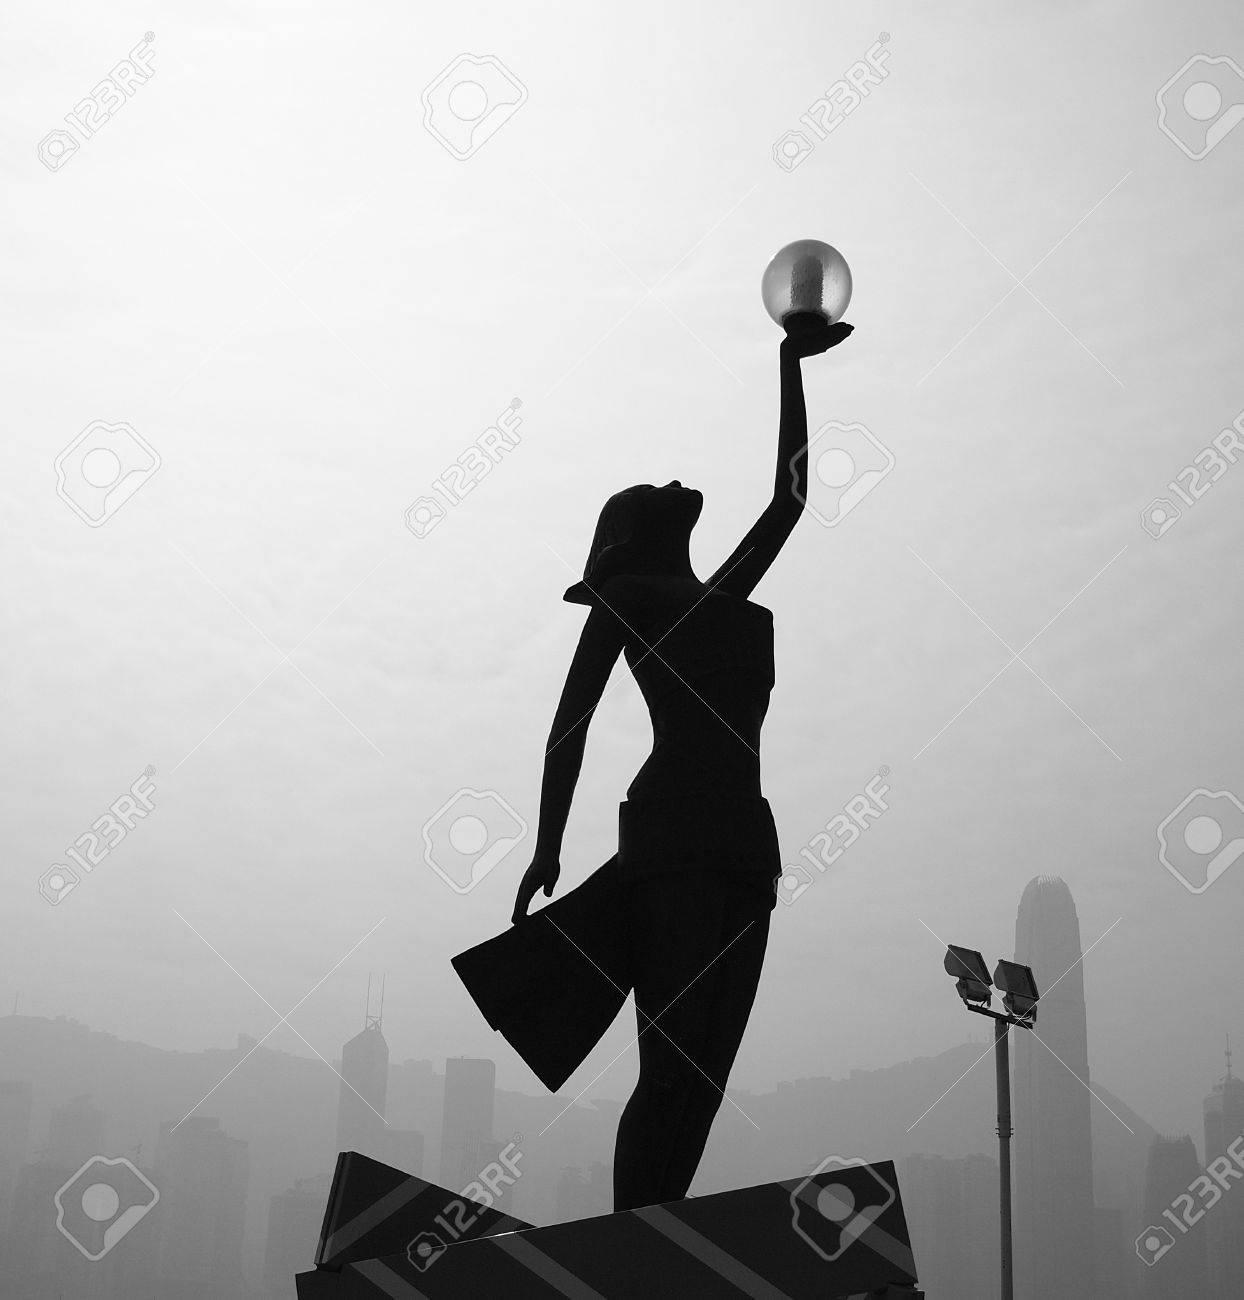 Woman silhouette raise hand Stock Photo - 9855424